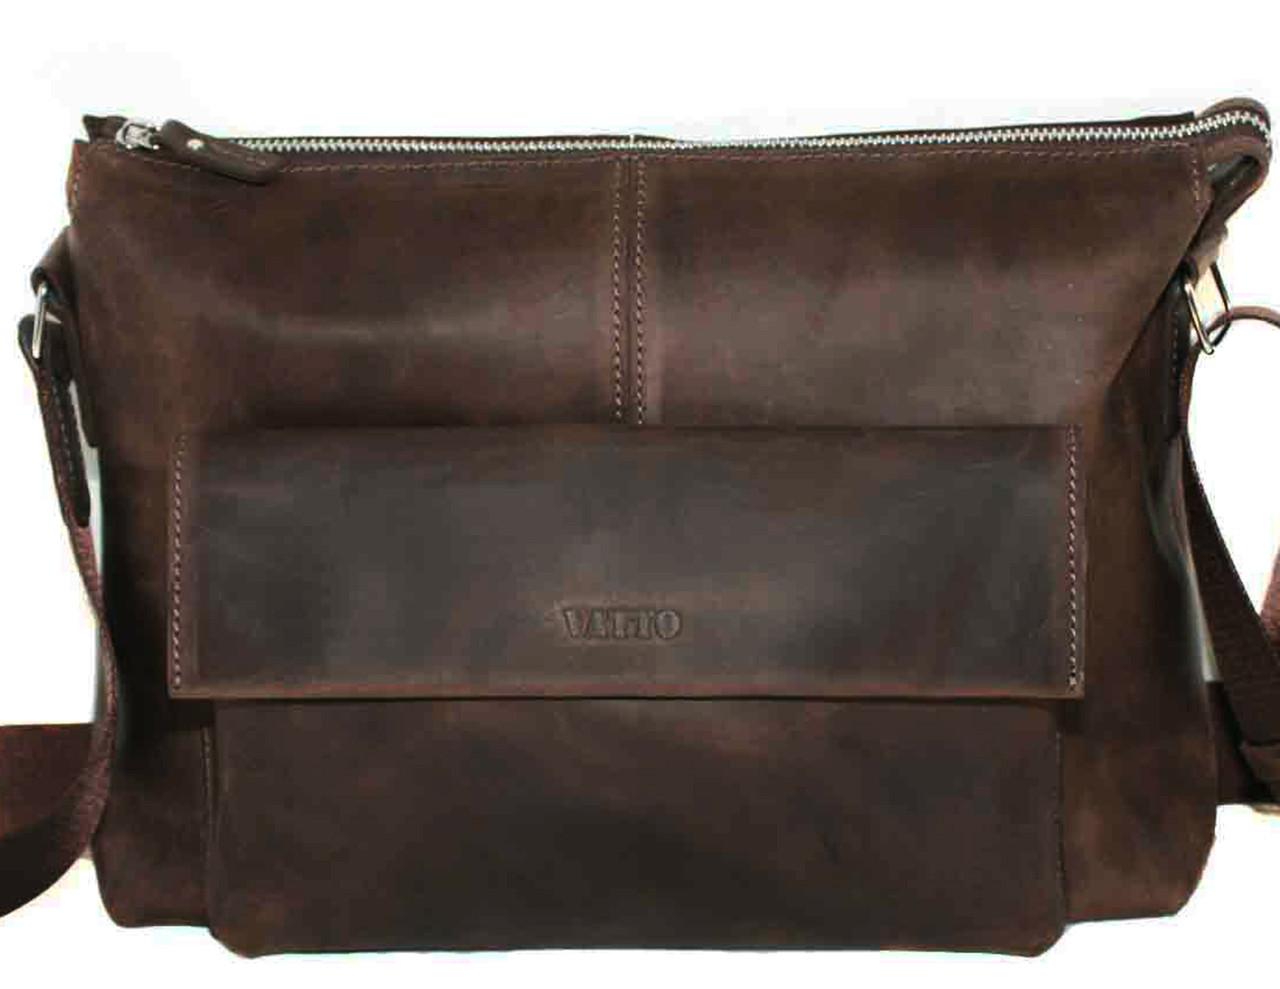 Кожаная мужская сумка Mk20.1 коричневая